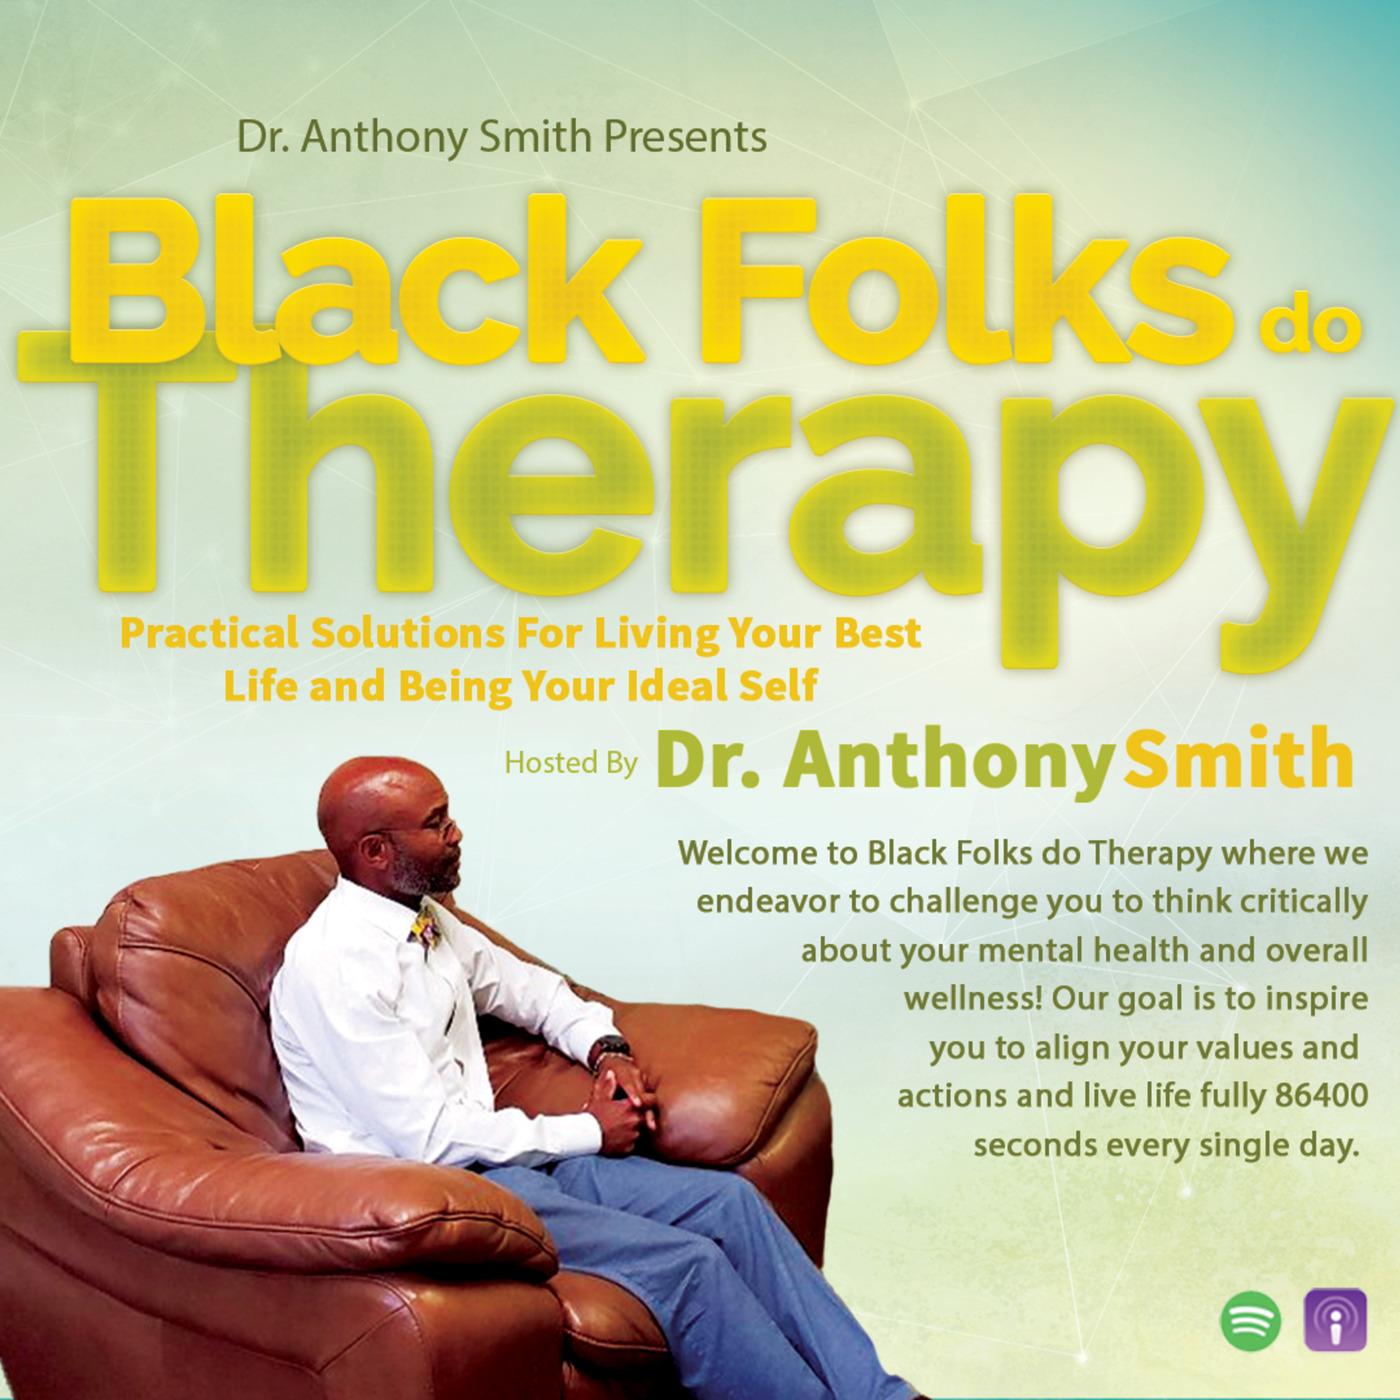 Black Folks do Therapy  12: Dr. Ifetayo Ojelade A Healing Paradigm (Atlanta, Georgia)